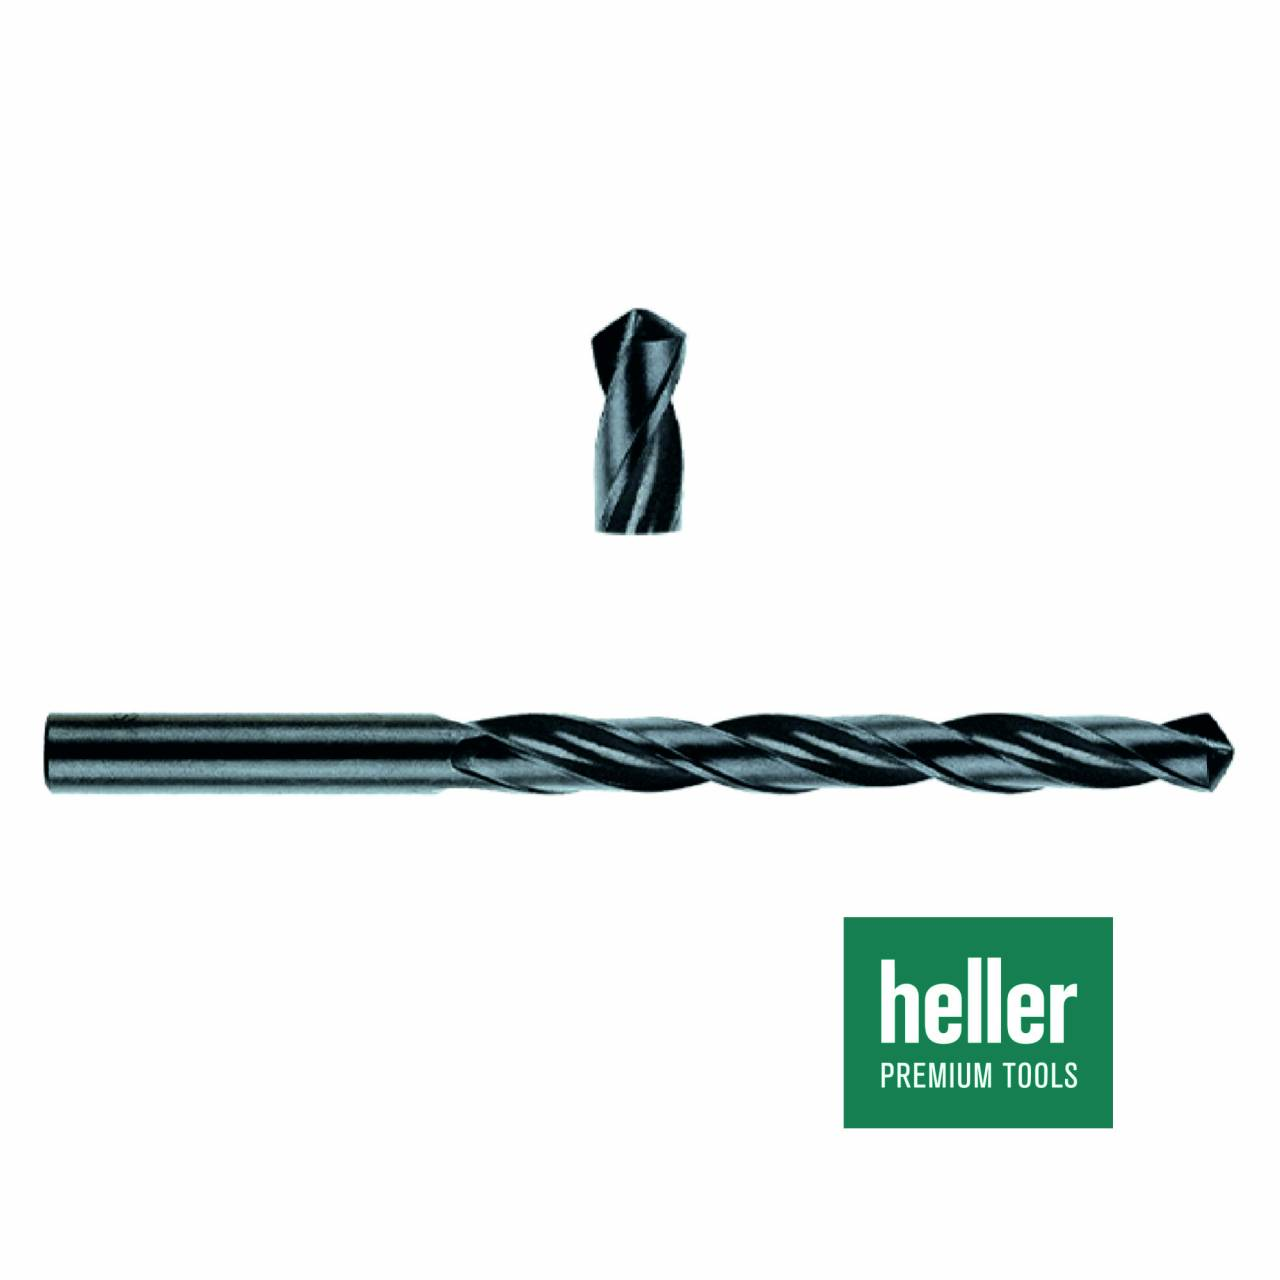 Stahlbohrer HSS-R 'Heller®' Ø 10 x 87 x 133 mm